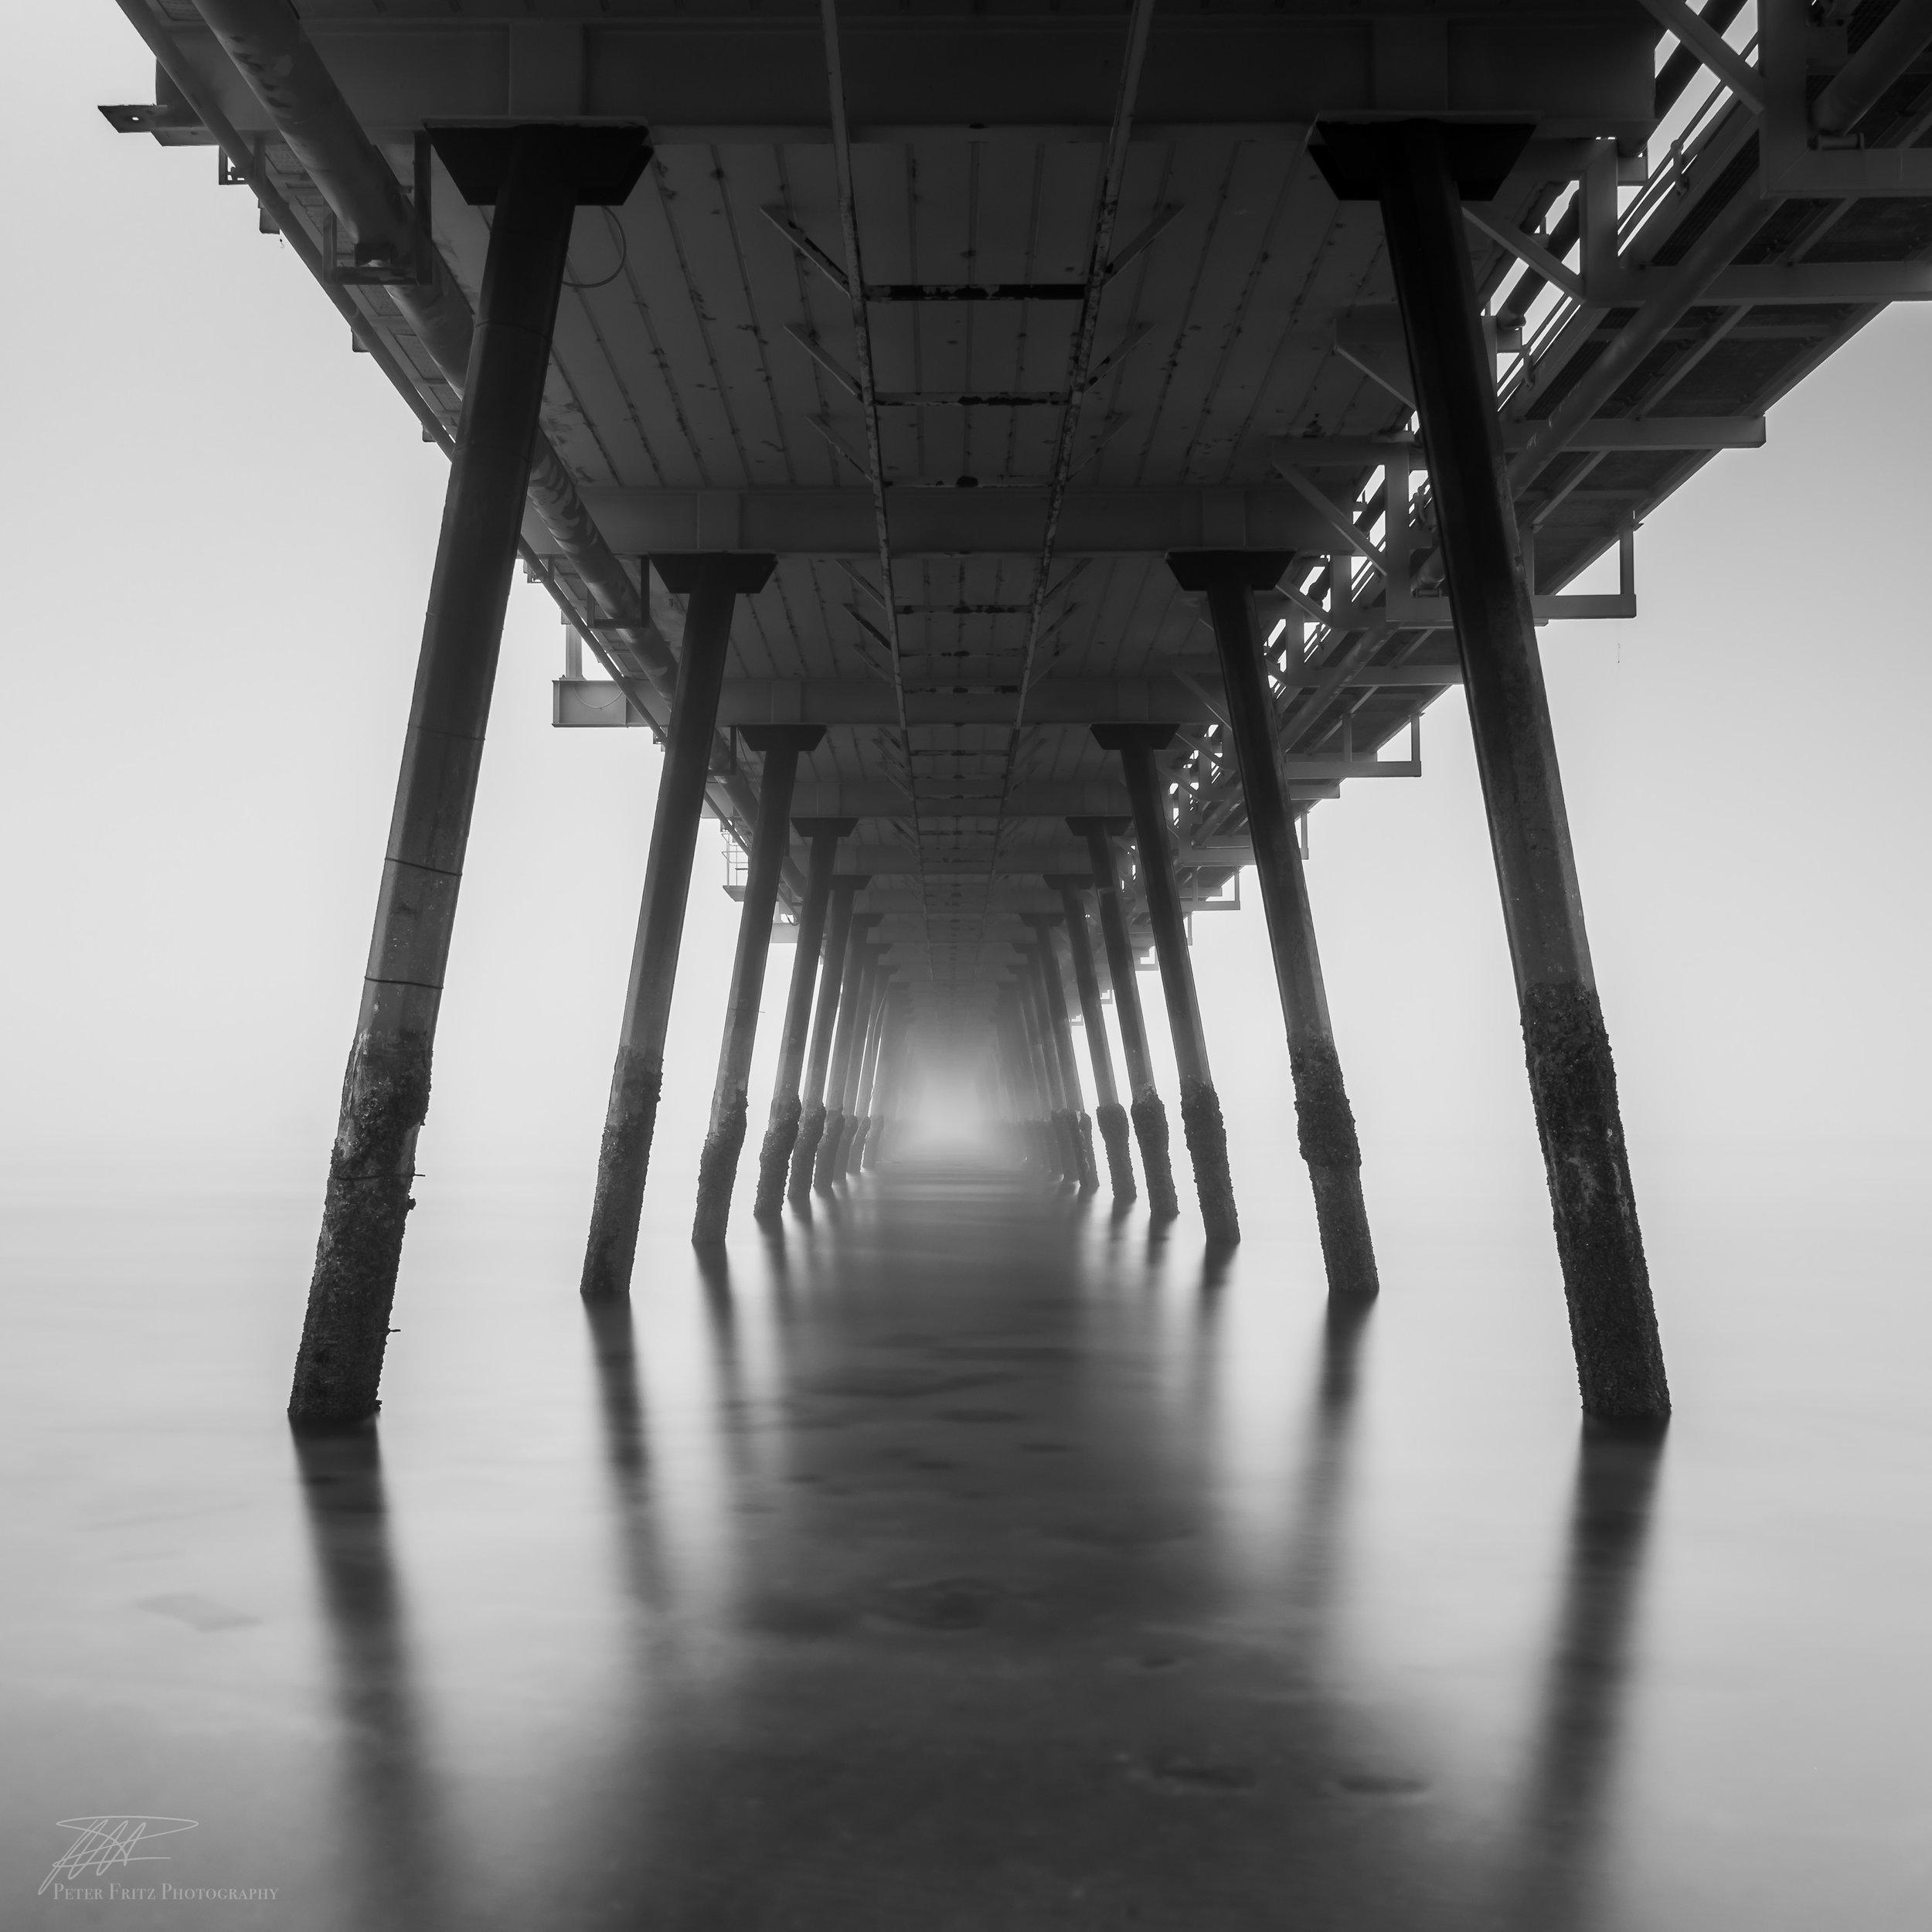 Broome wharf 1x1 web.jpg